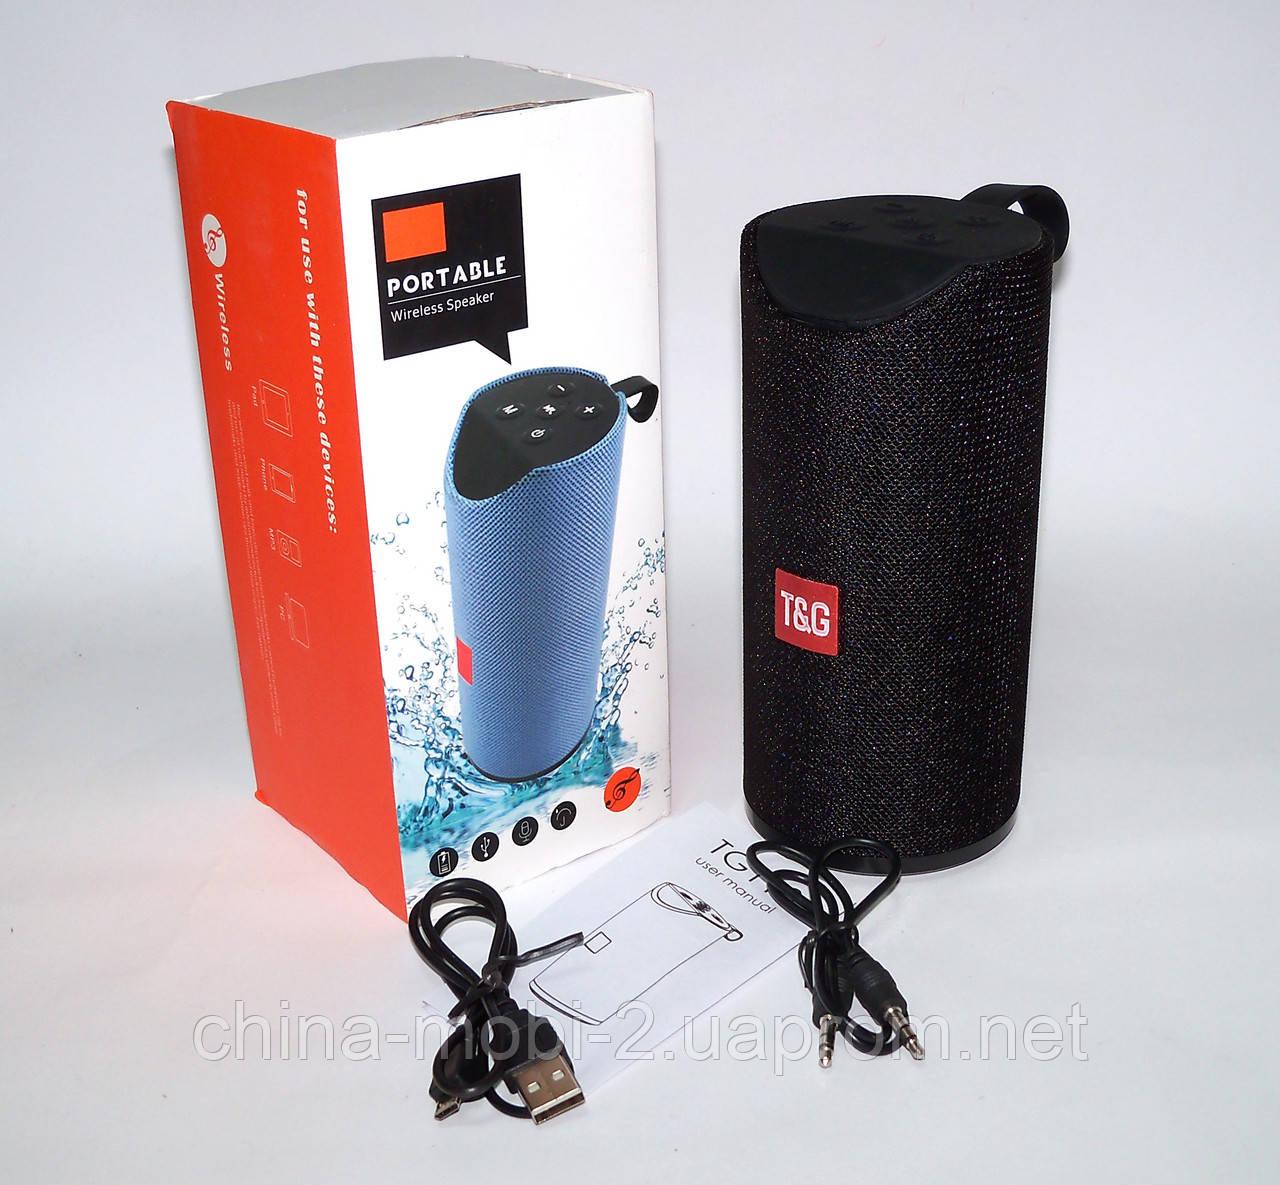 Беспроводная колонка T&G TG113 в стиле JBL с FM/Bluetooth/MP3/USB/microSD,  черная  Интернет- магазин Mobi-China - 652897755 дрошиппинг опт оптом